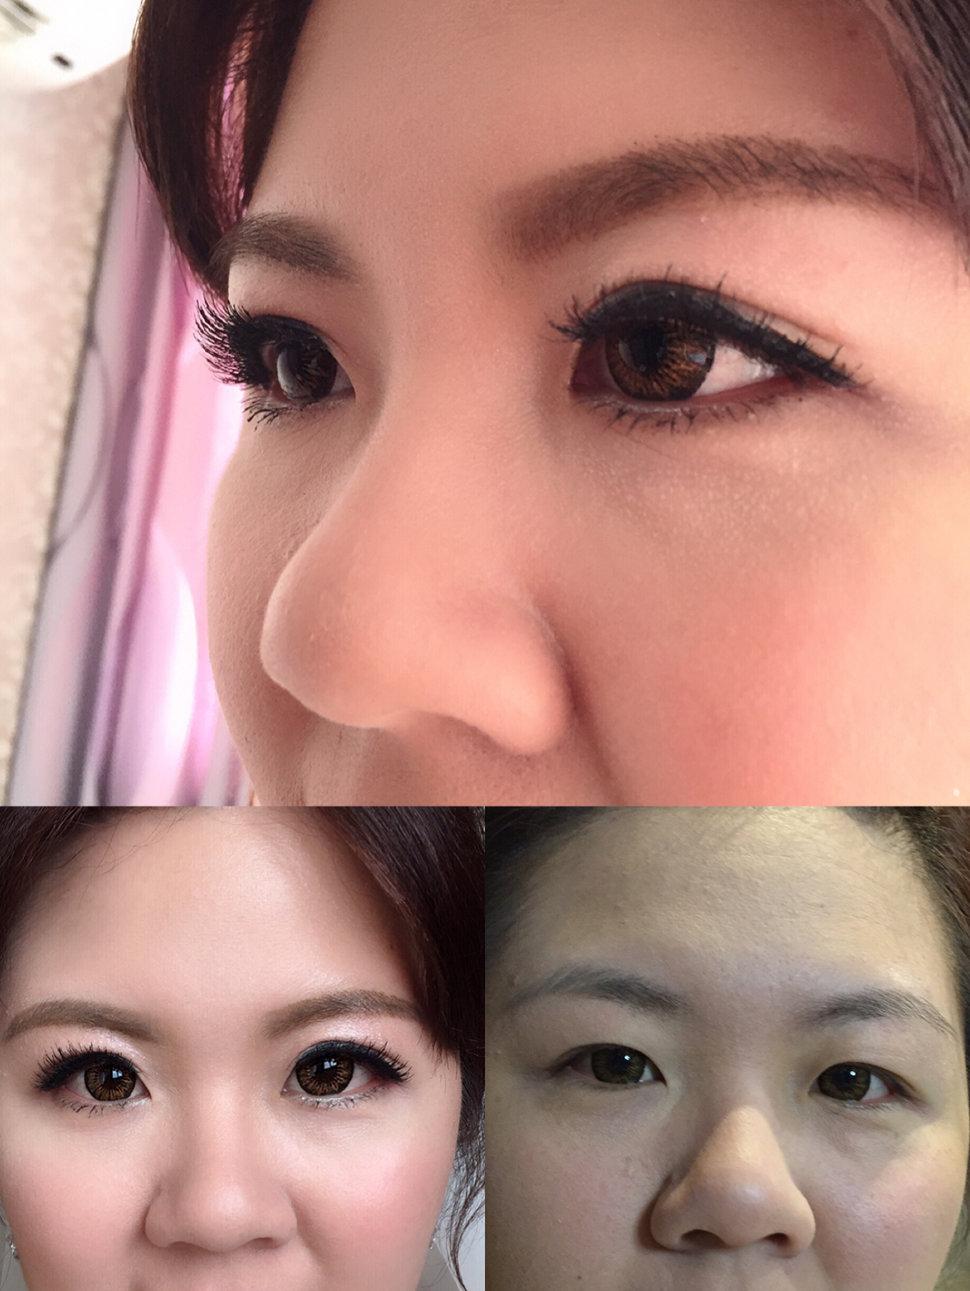 IMG_9846 - Jojo chen Makeup新娘秘書《結婚吧》